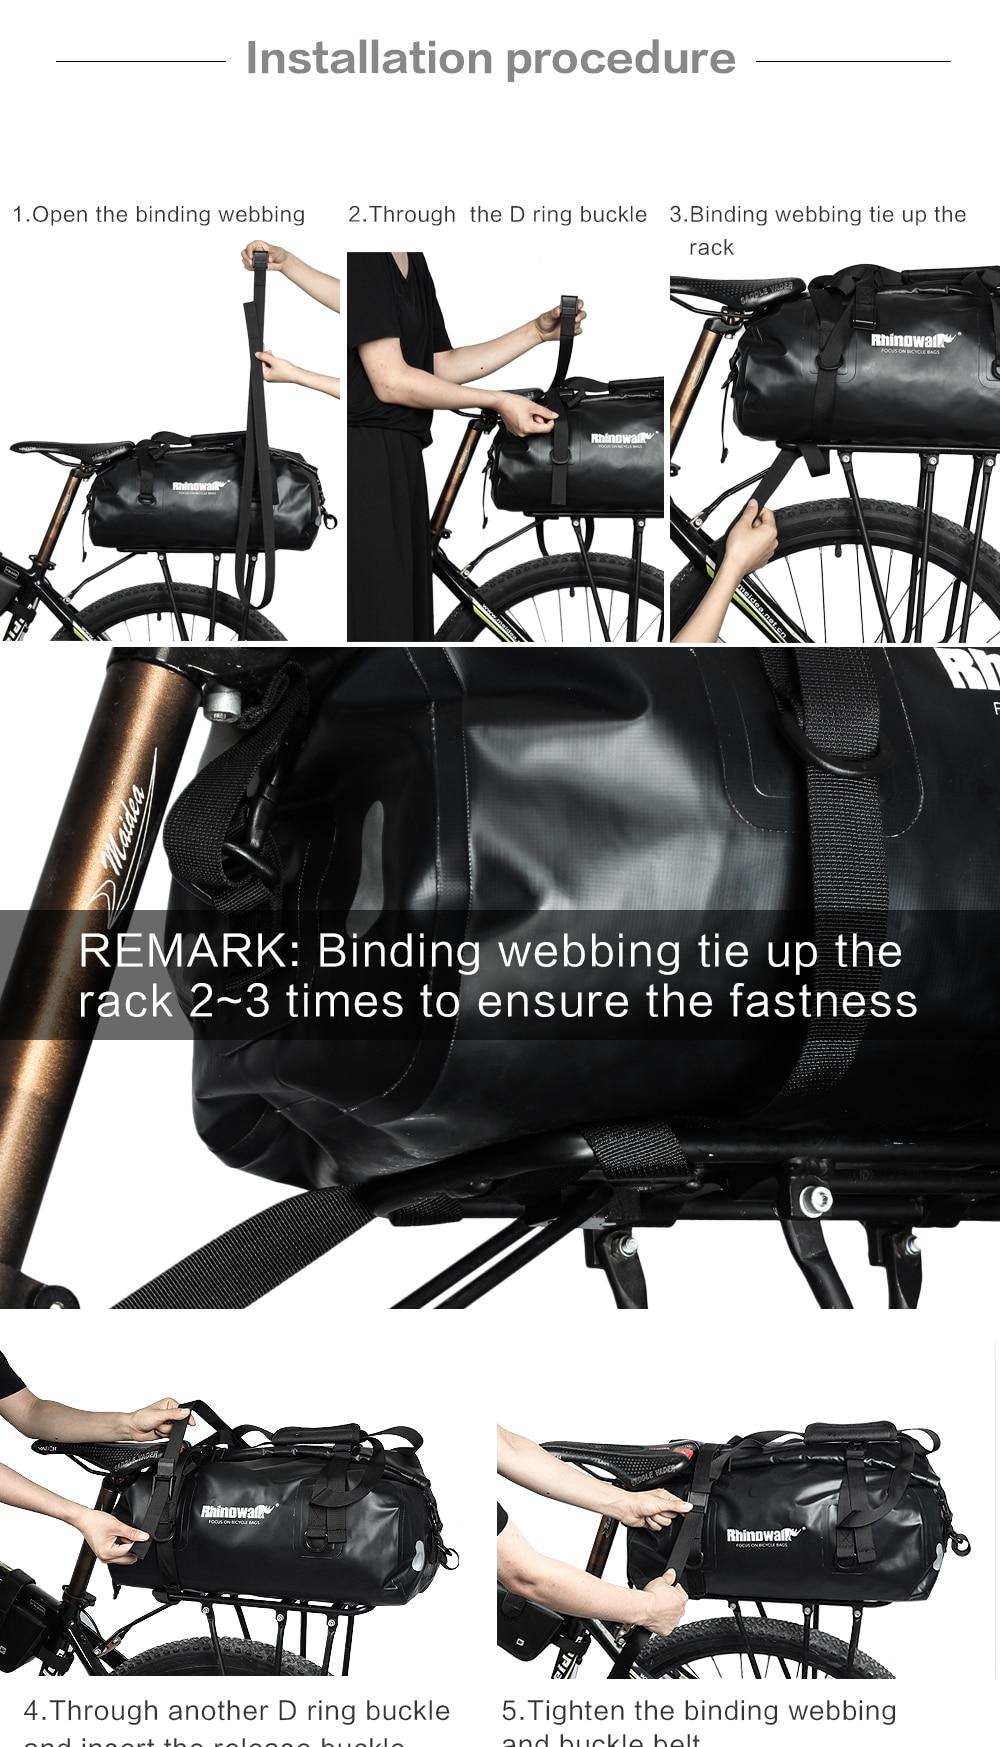 Rhinowalk Bicycle Luggage Bags 20L Full Waterproof for Road Bike Rear Rack Trunk Cycling Saddle Storage Pannier Multi Travel Bag (21)